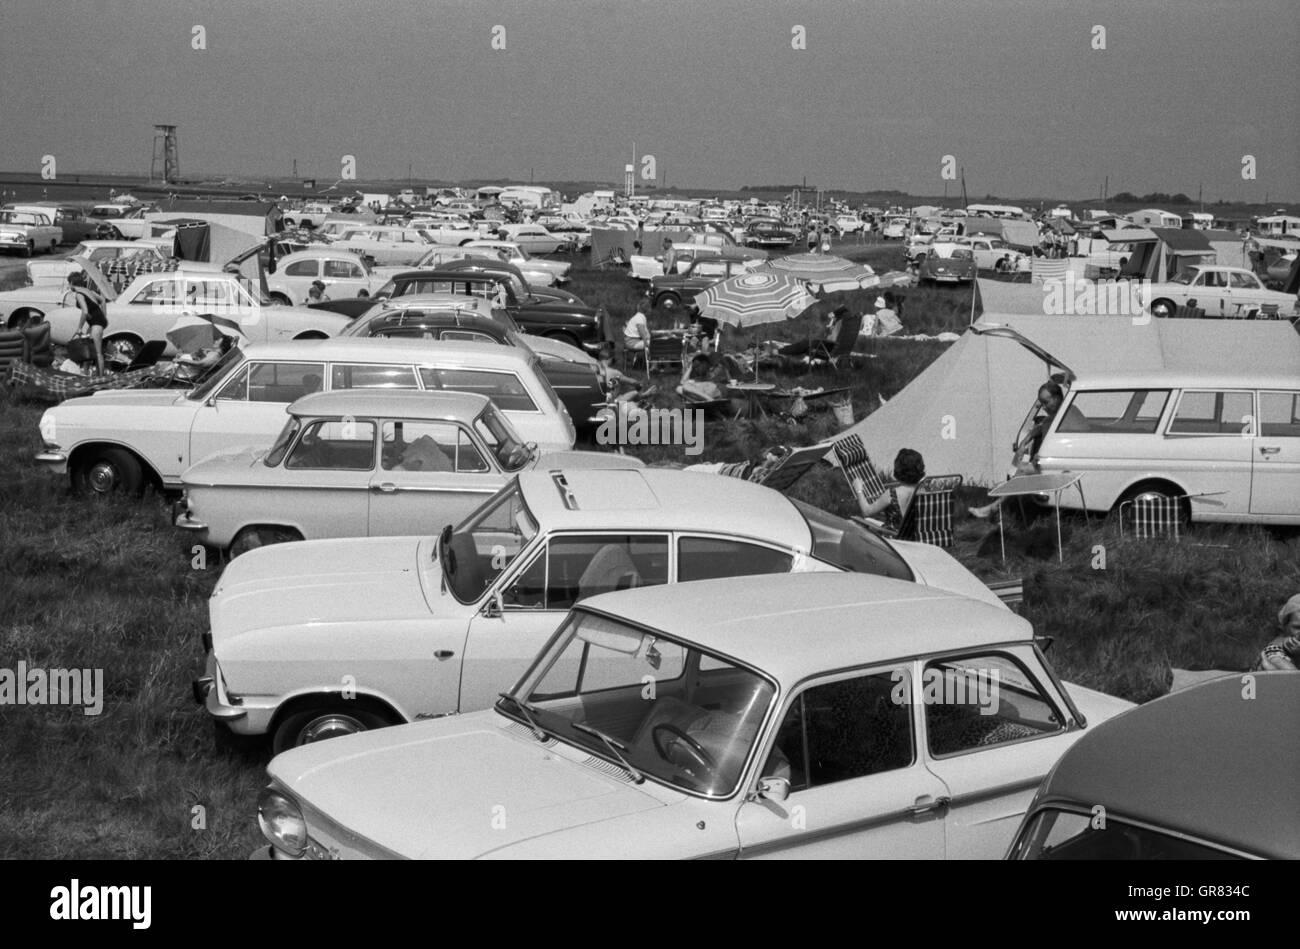 Beach Dorum 1966 Bw - Stock Image